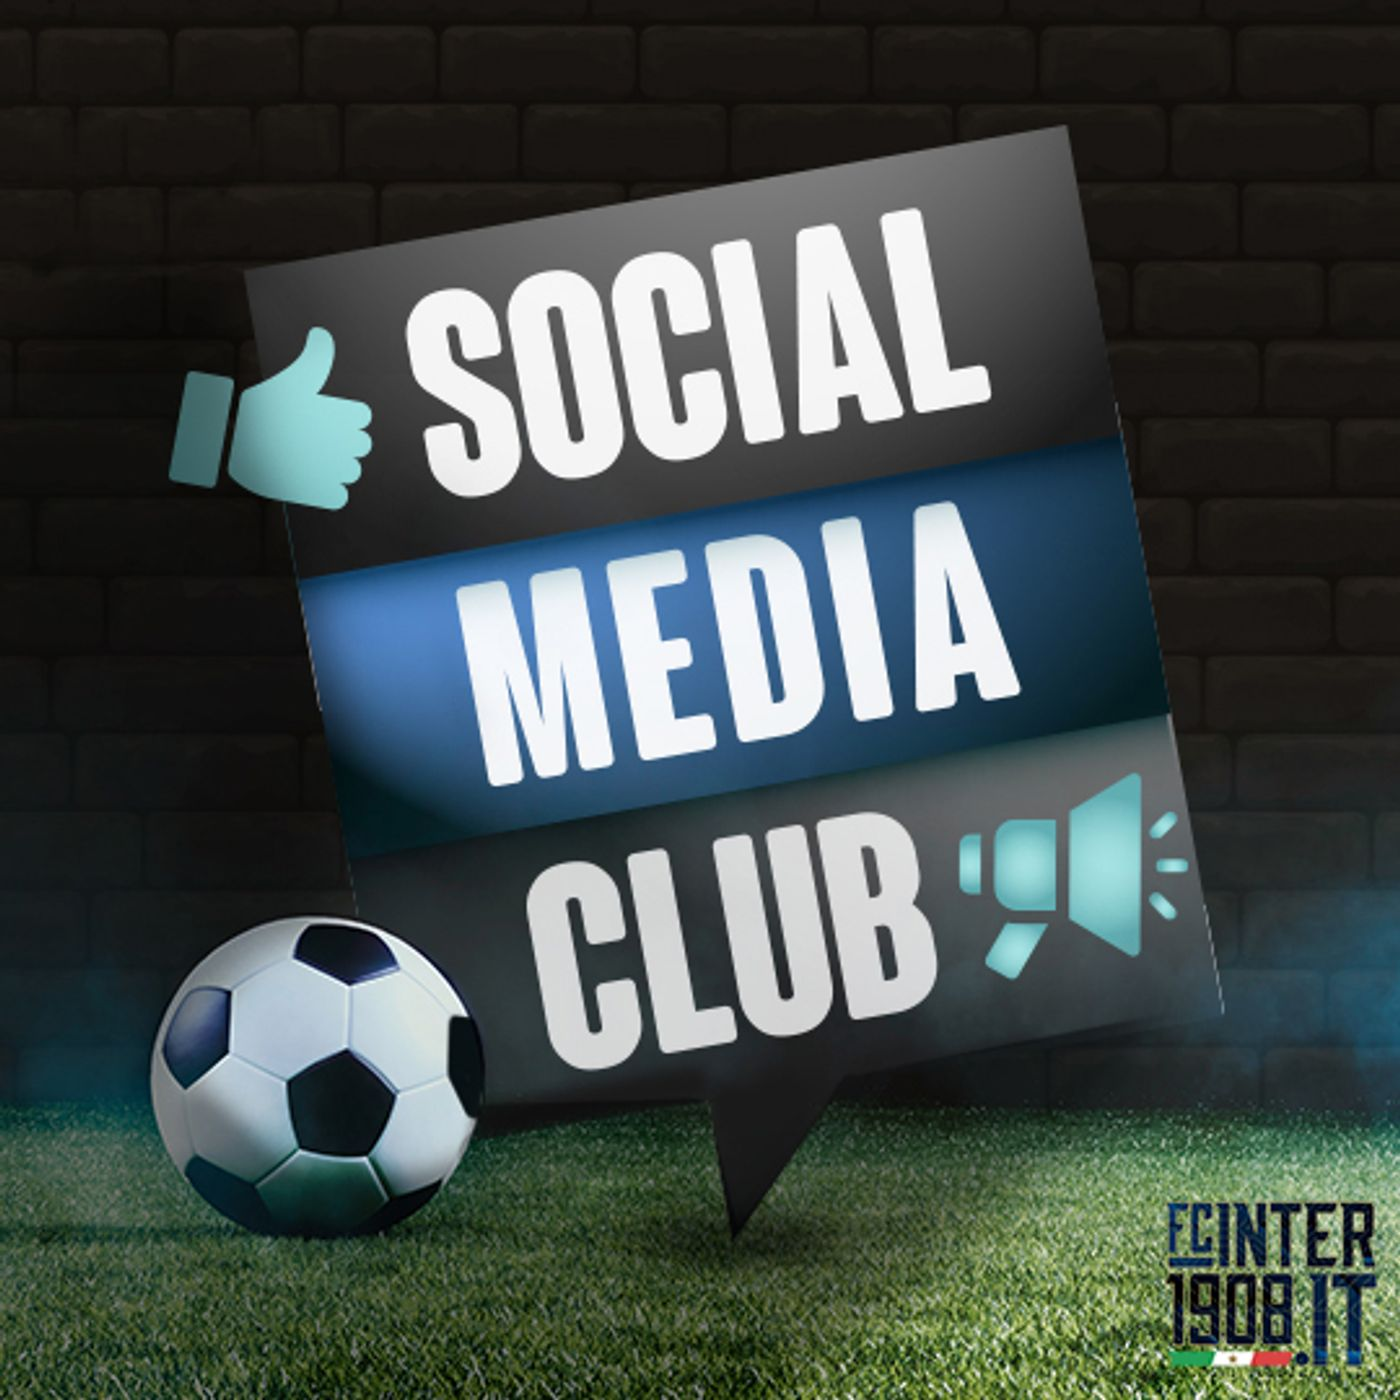 Episodio Social Media Club - 29/07/2021